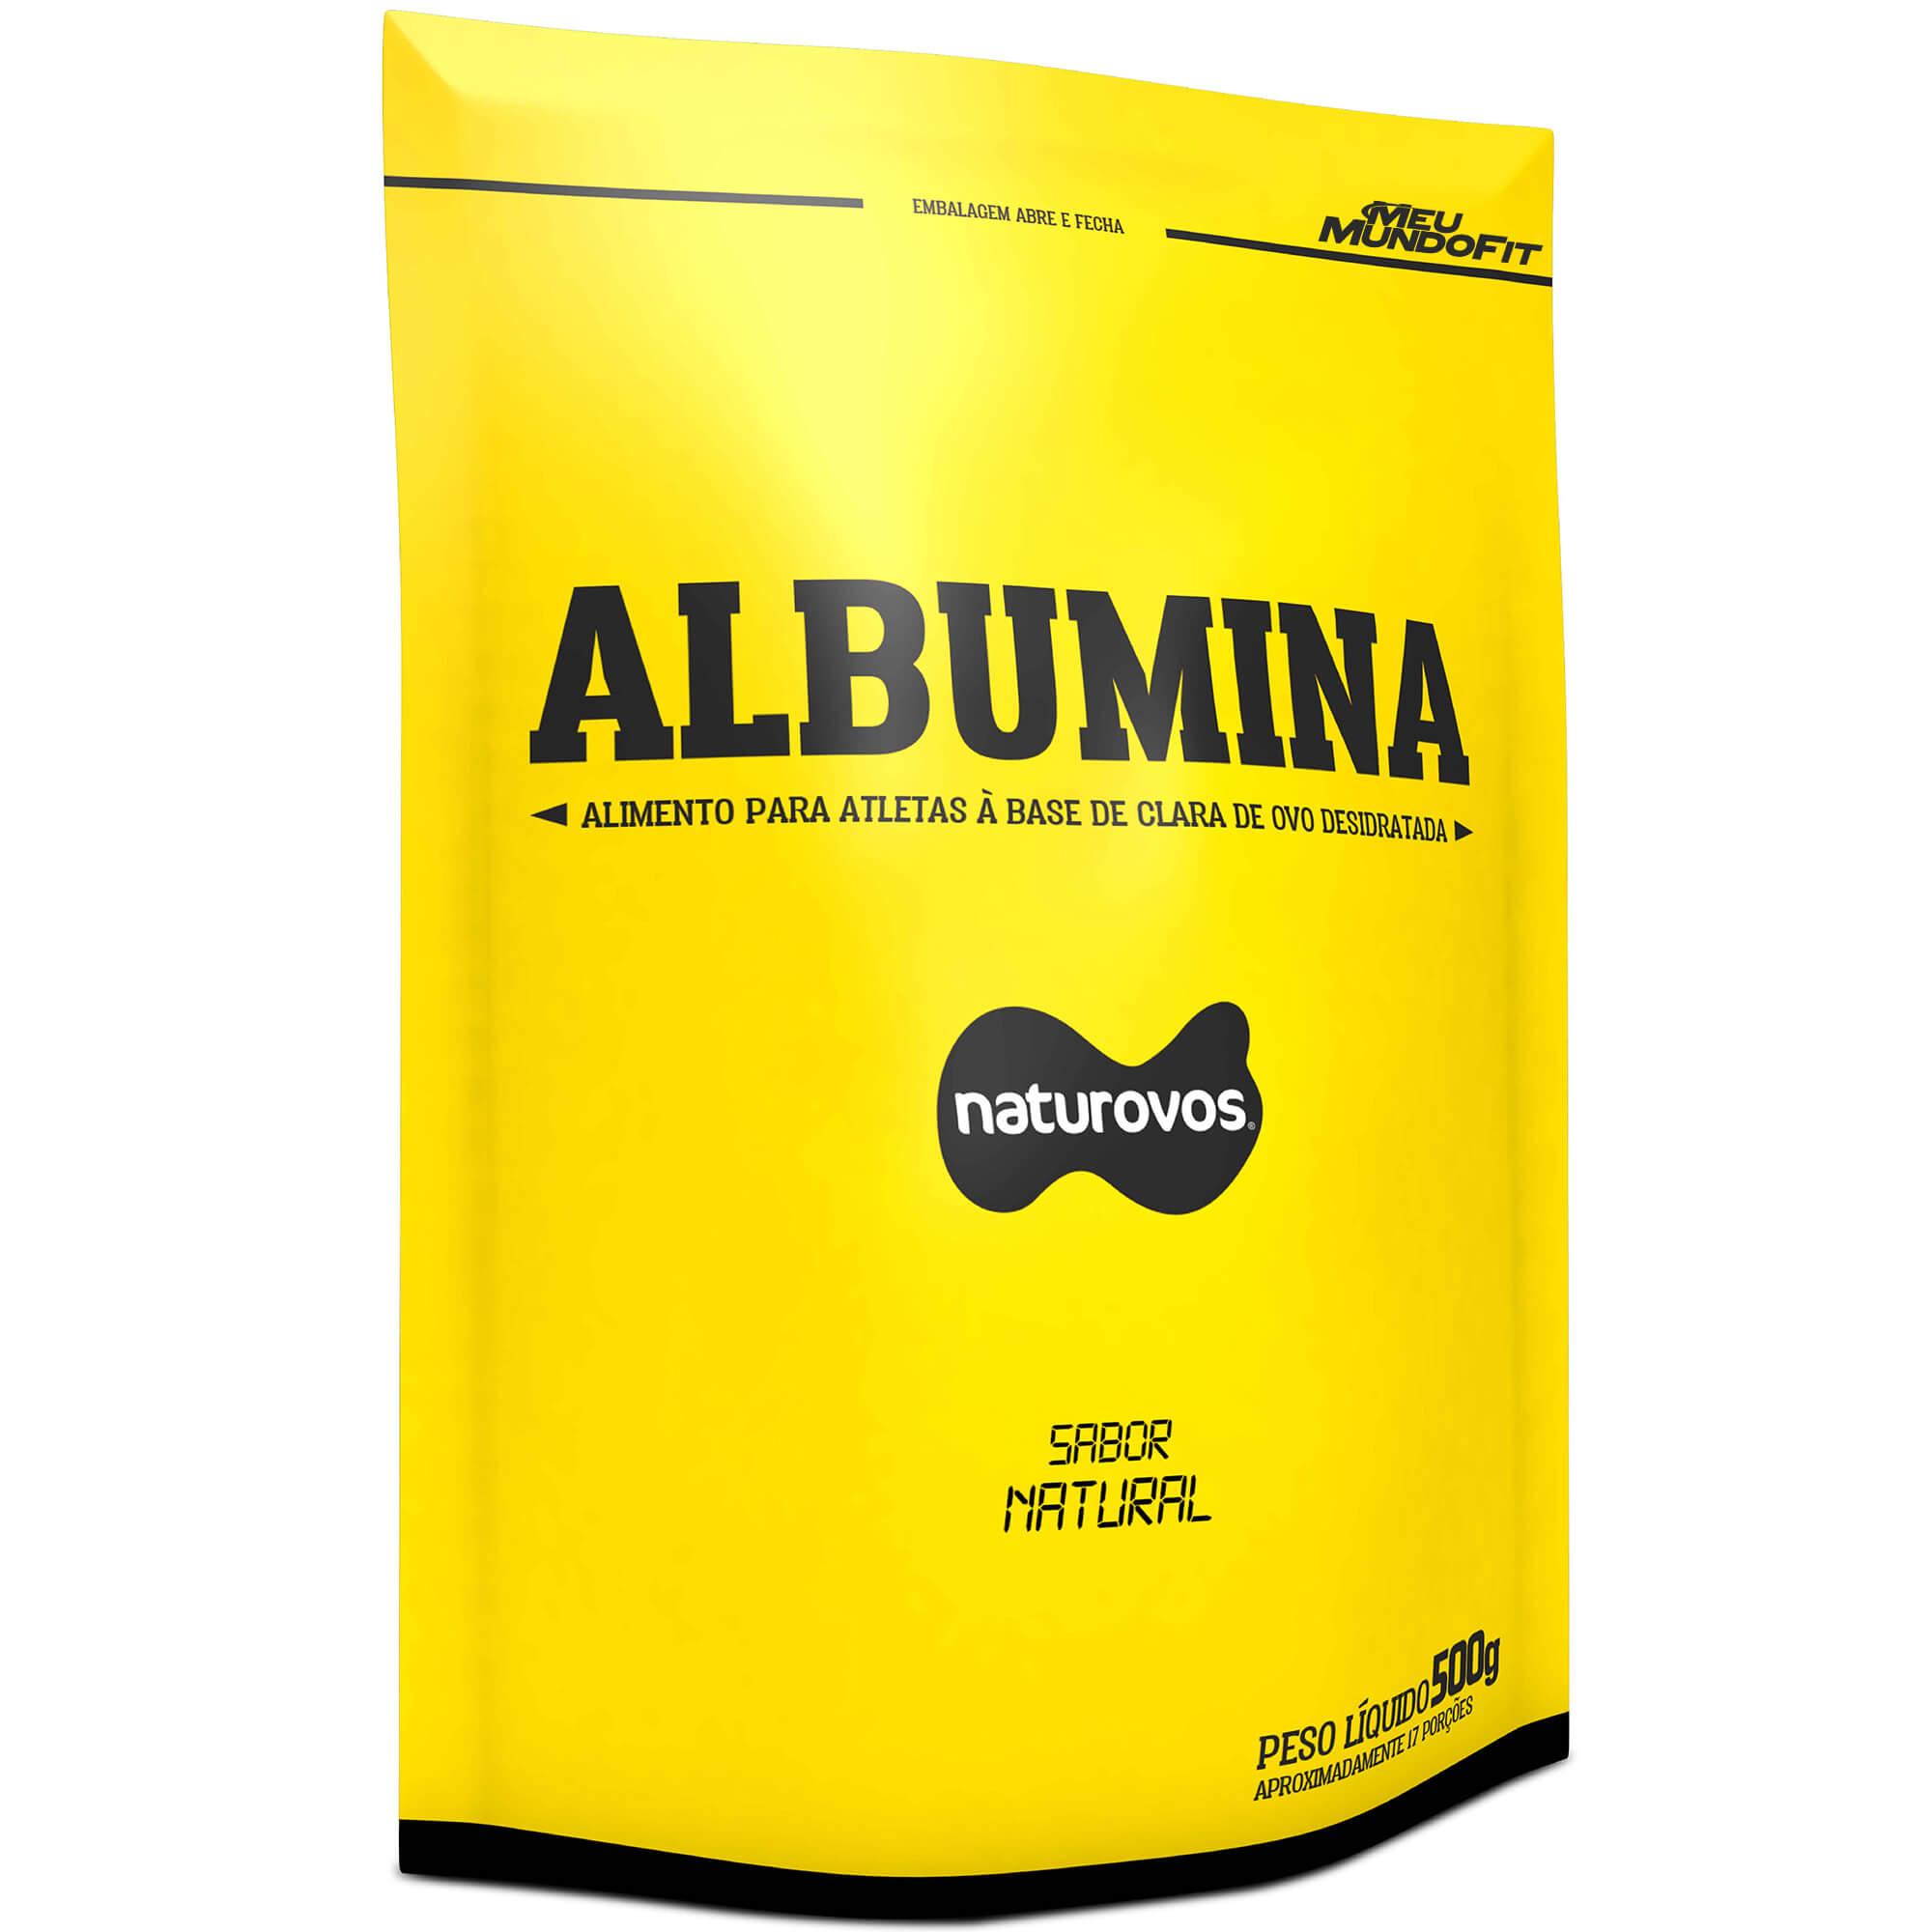 Albumina - Naturovos